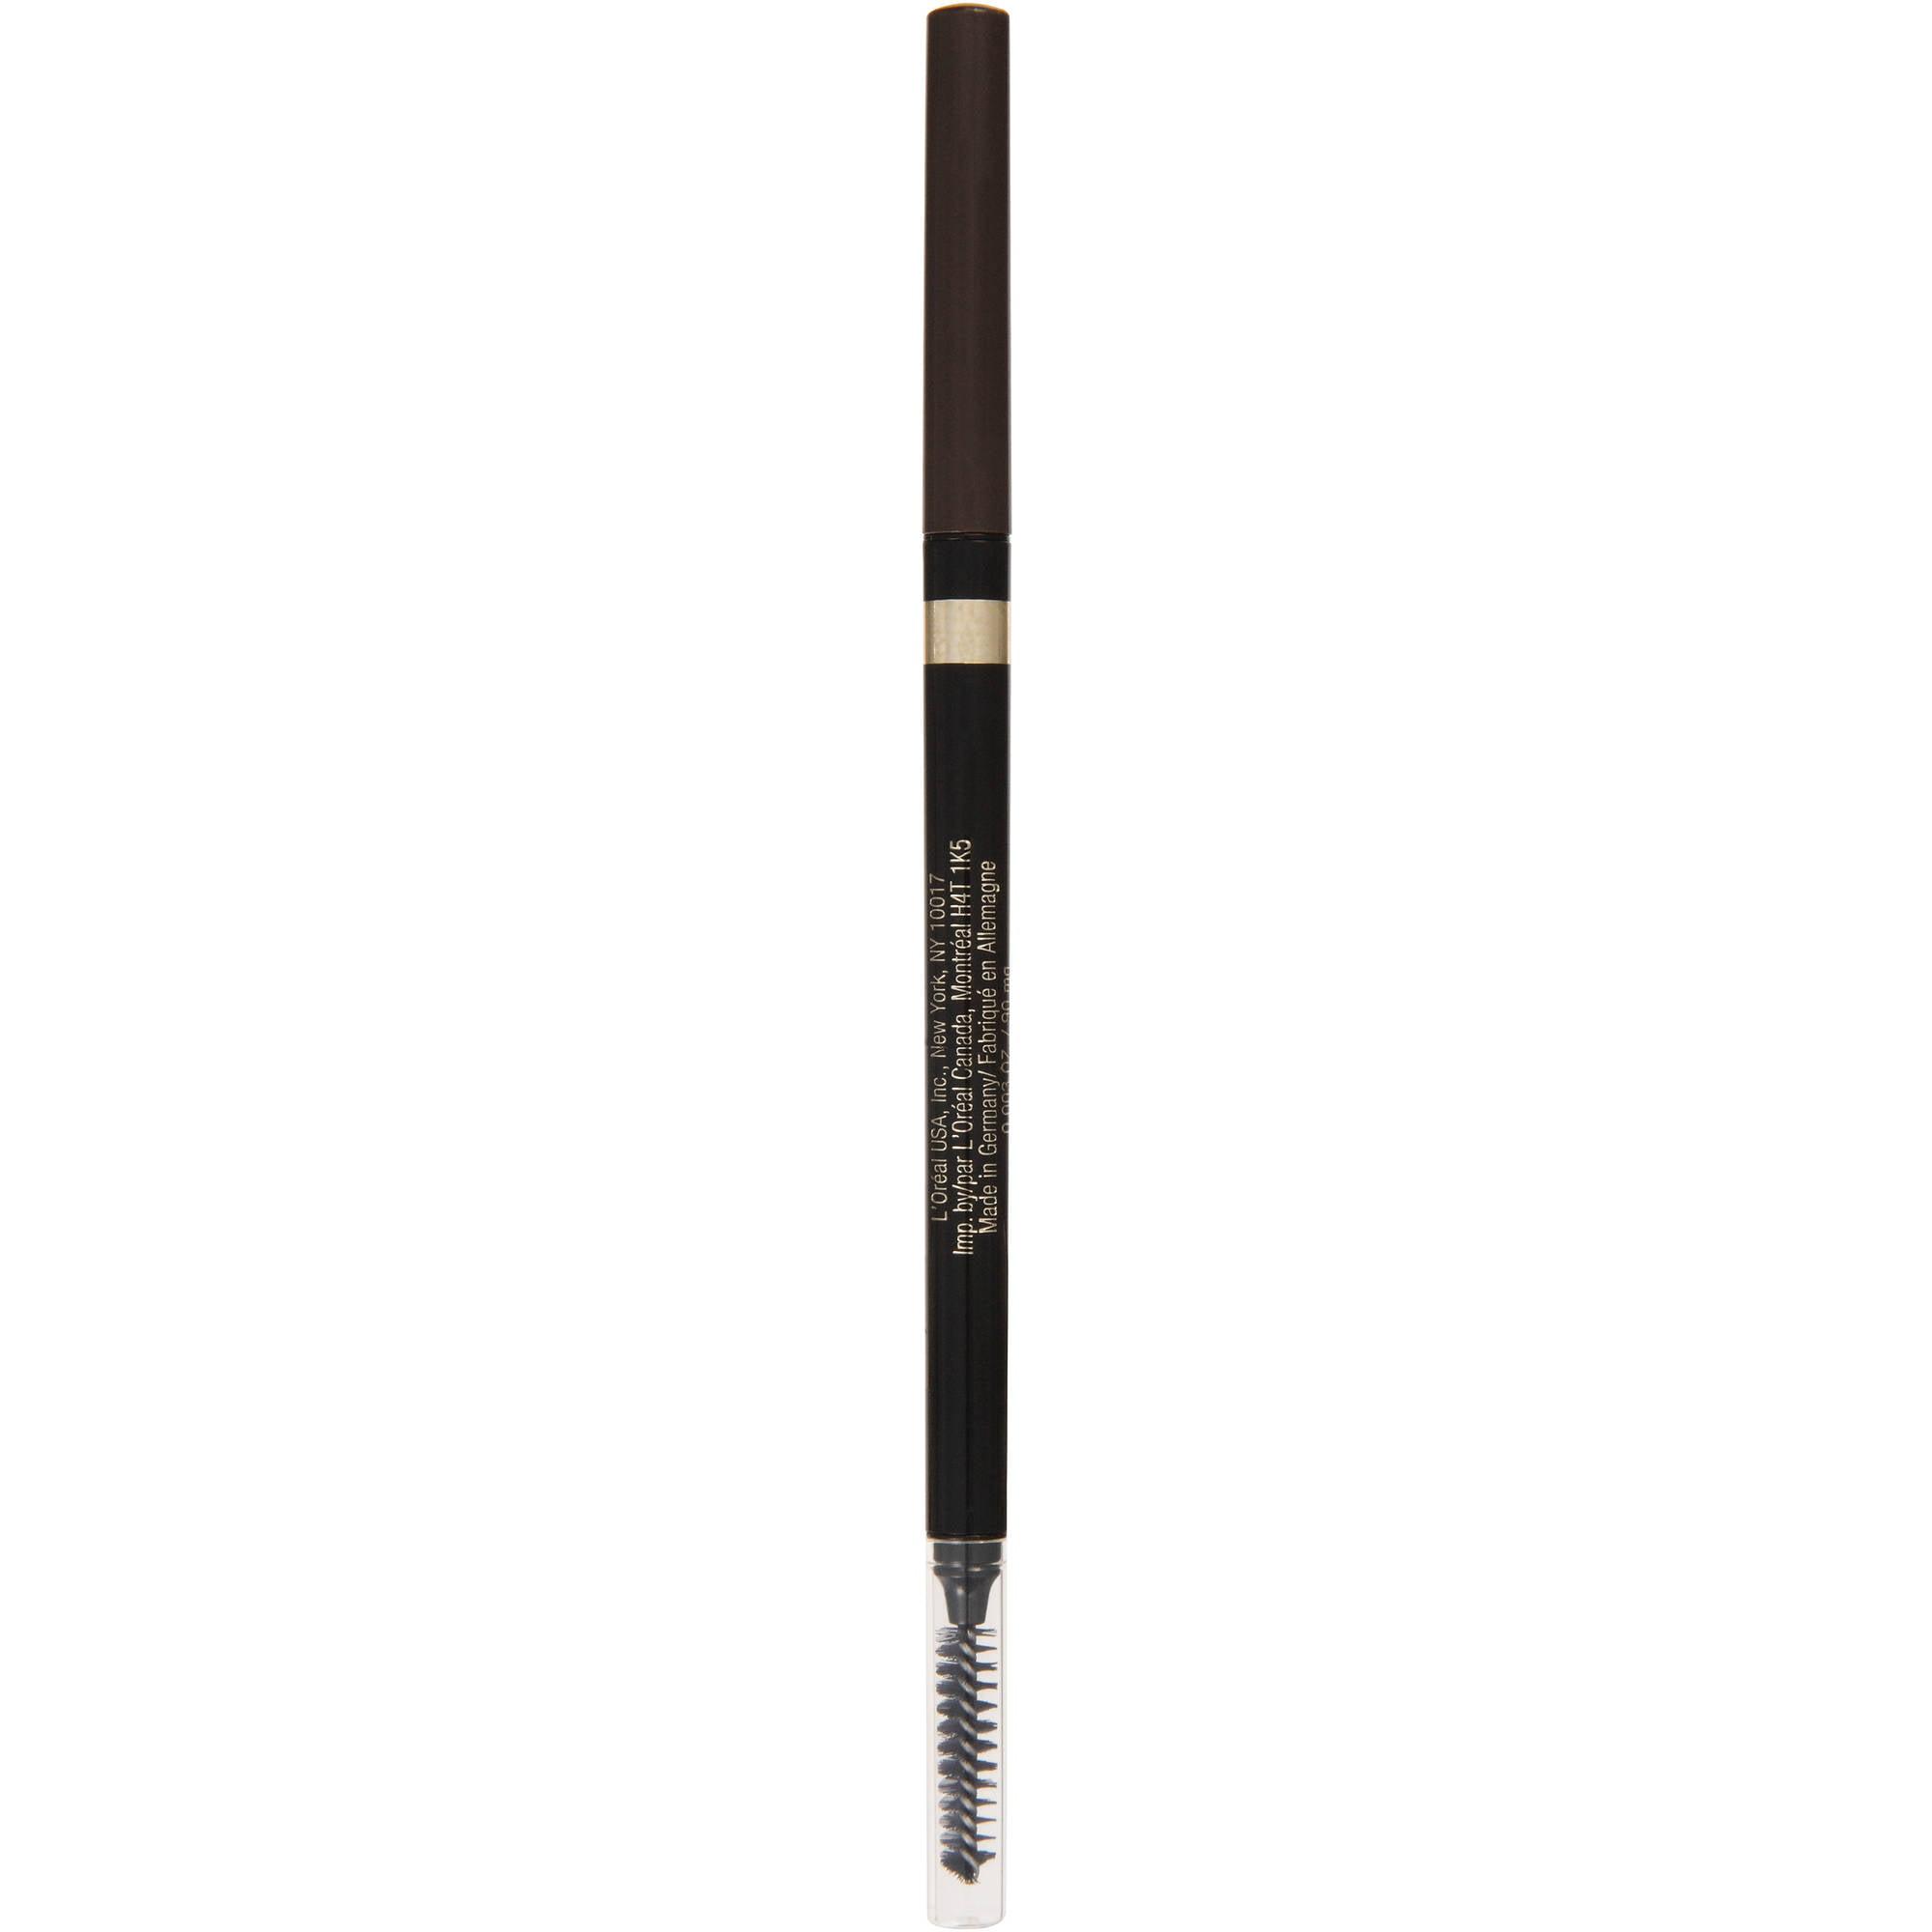 Loreal Paris Brow Stylist Definer Pencil Brunette Walmart